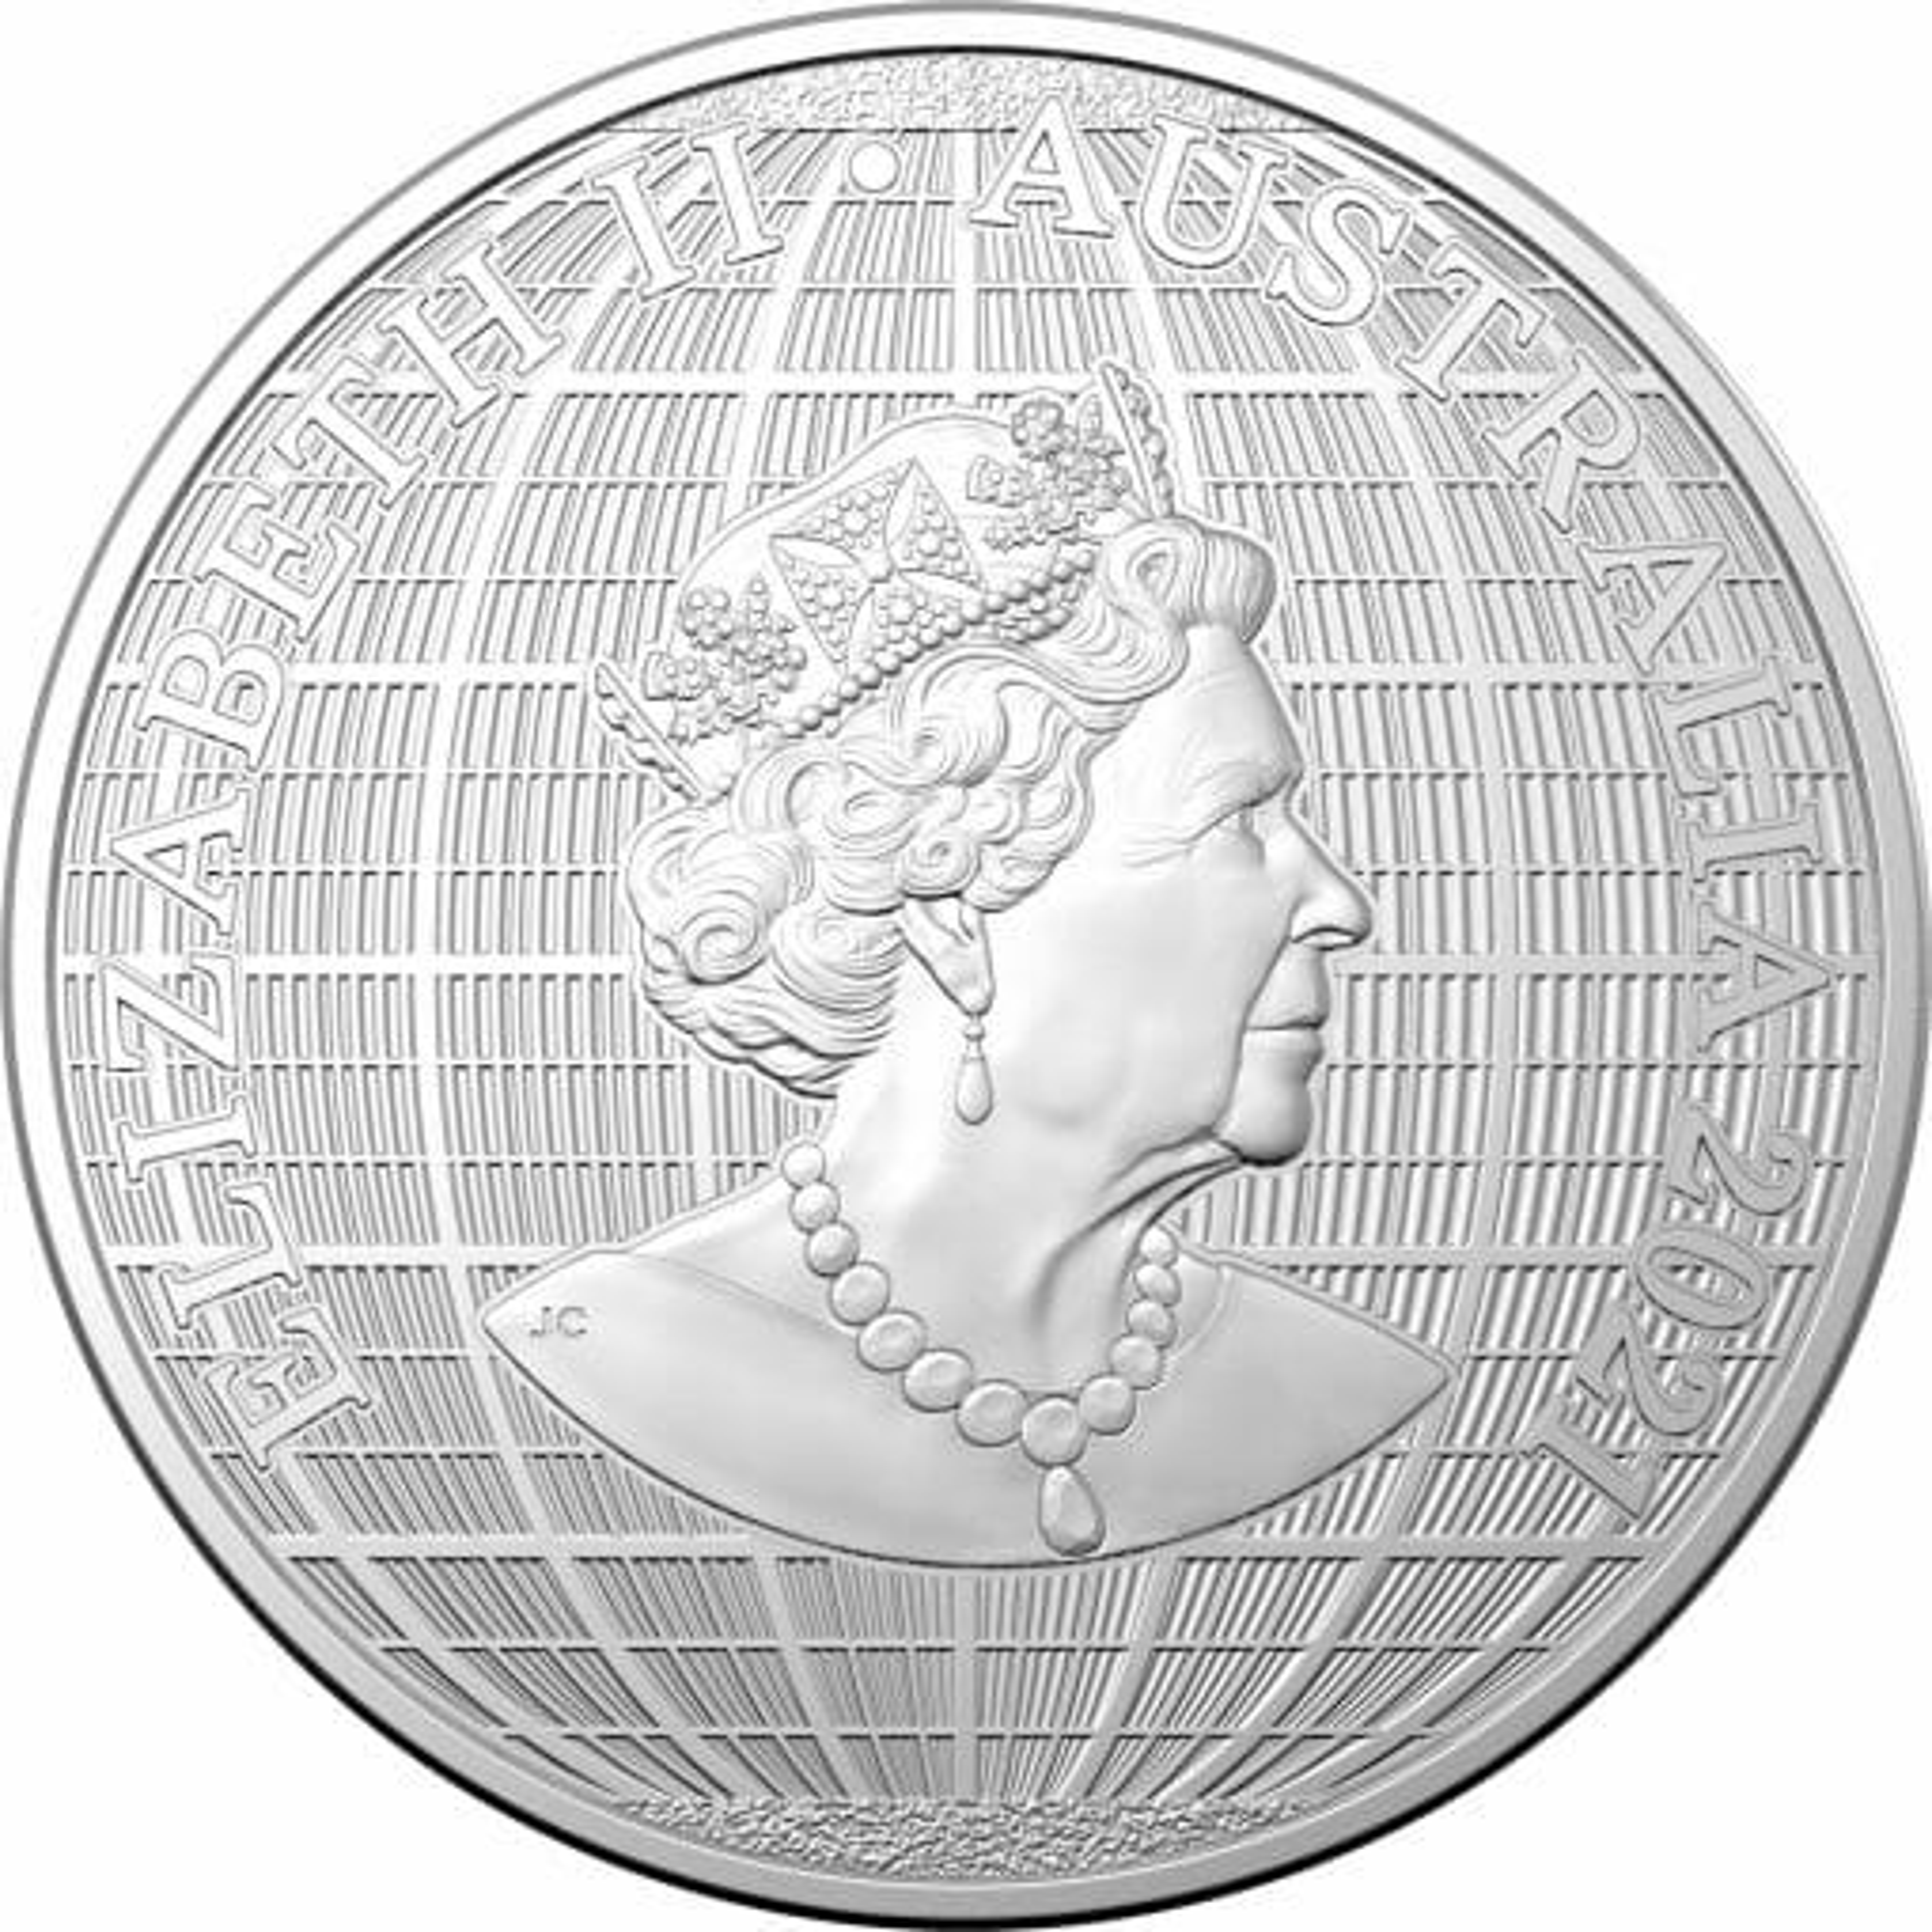 2021 $1 Beneath the Southern Skies 1oz .9999 Silver Bullion Coin - Platypus 2